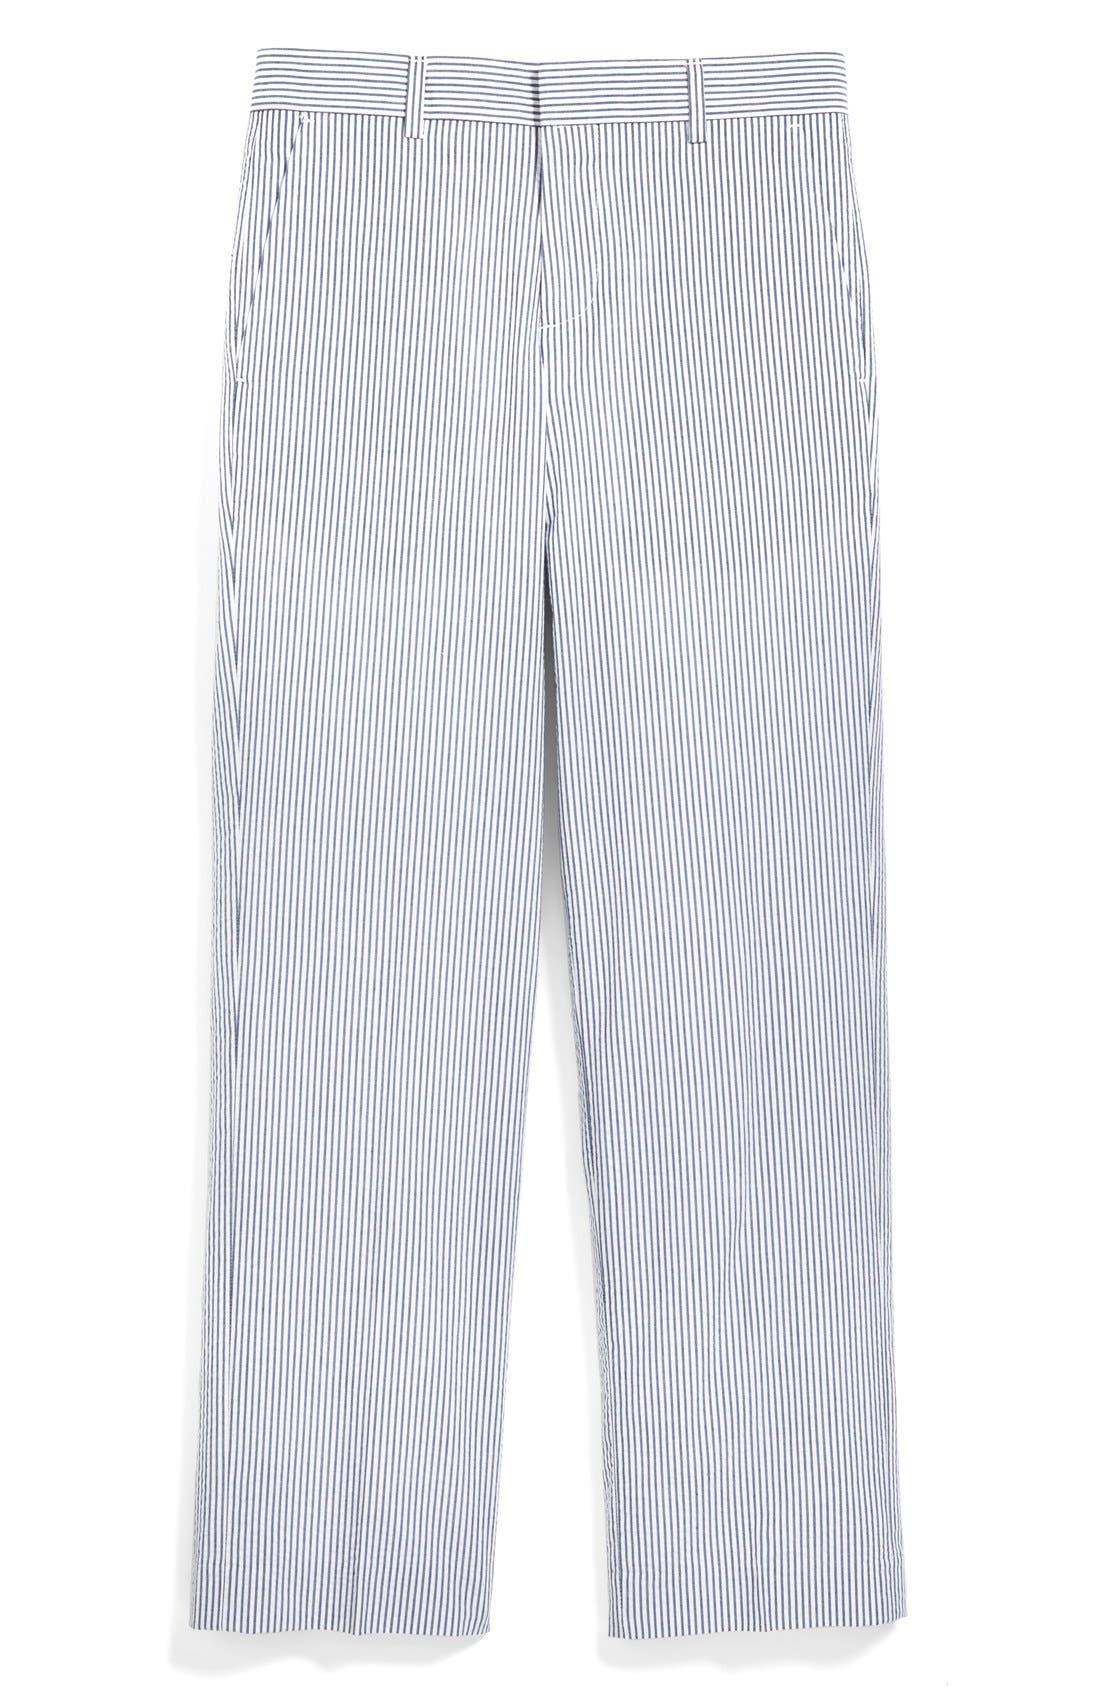 Alternate Image 1 Selected - Nordstrom 'Quentin' Seersucker Trousers (Toddler Boys, Little Boys & Big Boys)